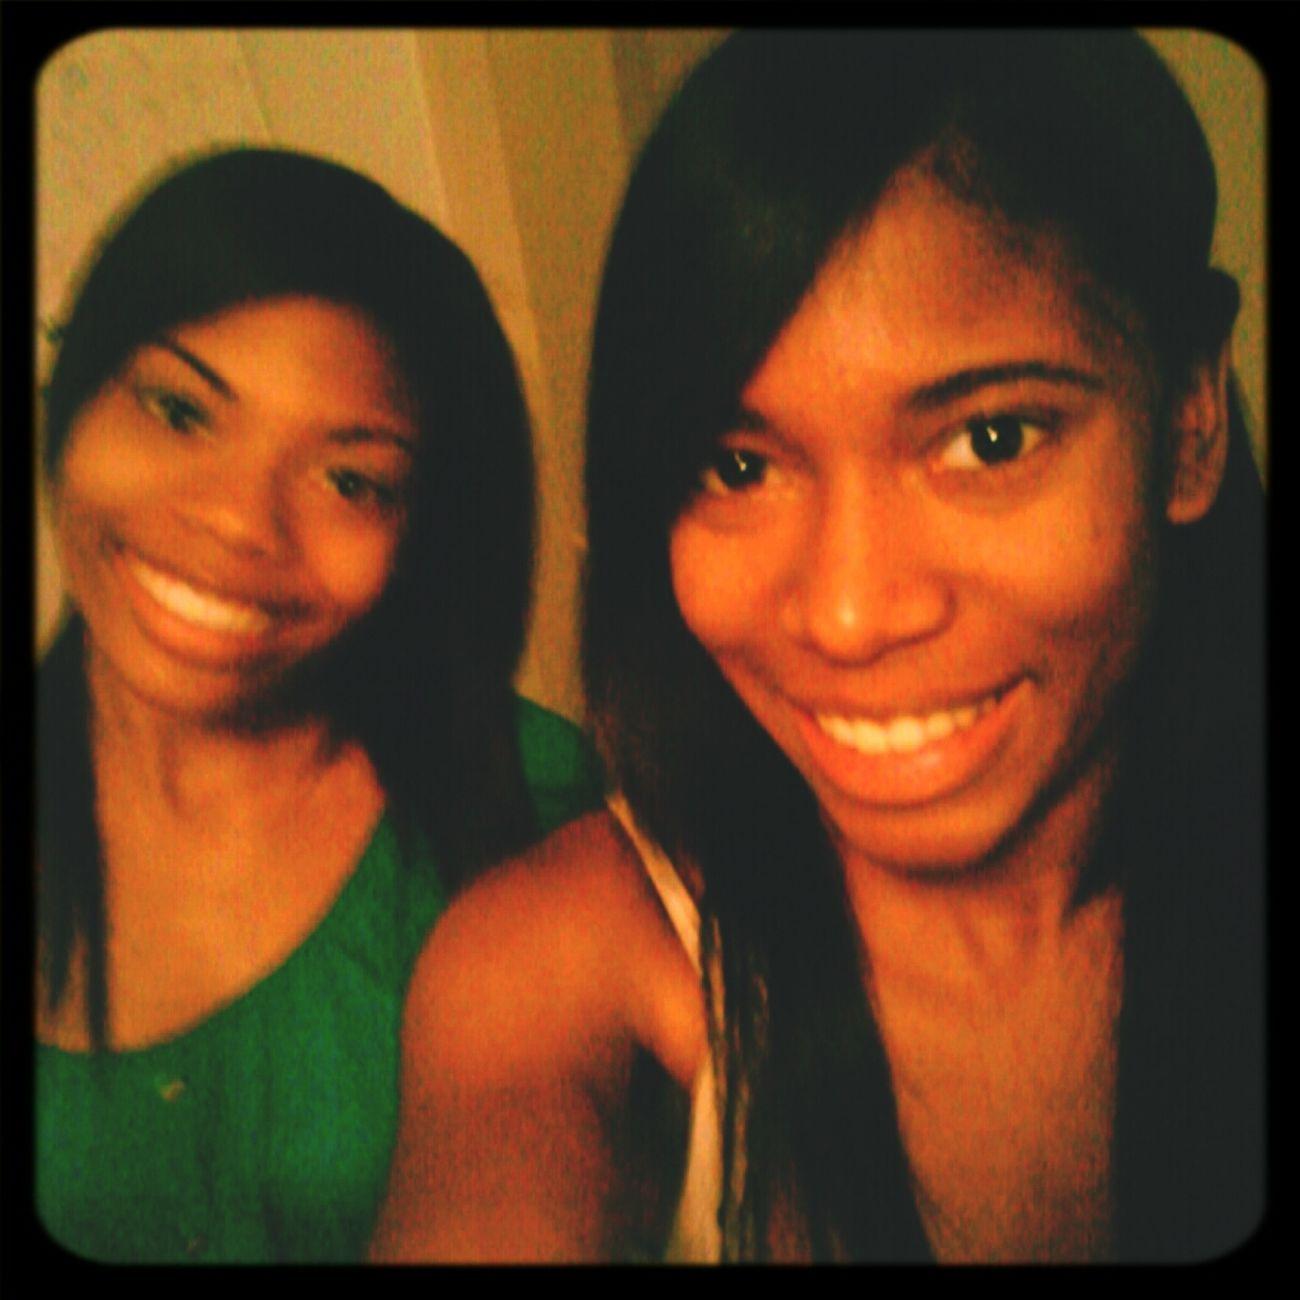 Me &&* My Sister